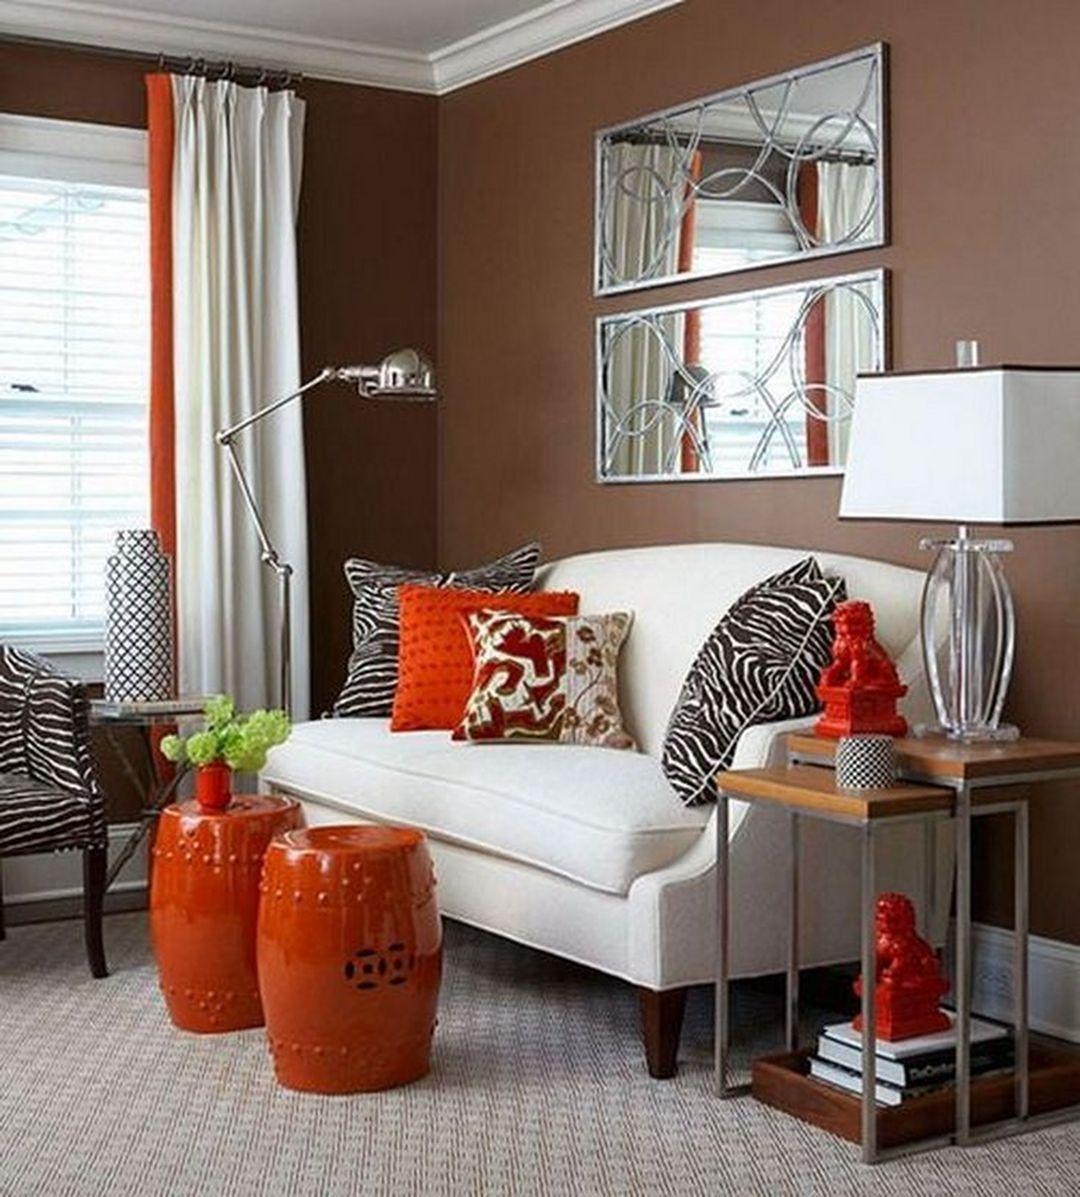 pinhanna kim on living room ideas  living room decor